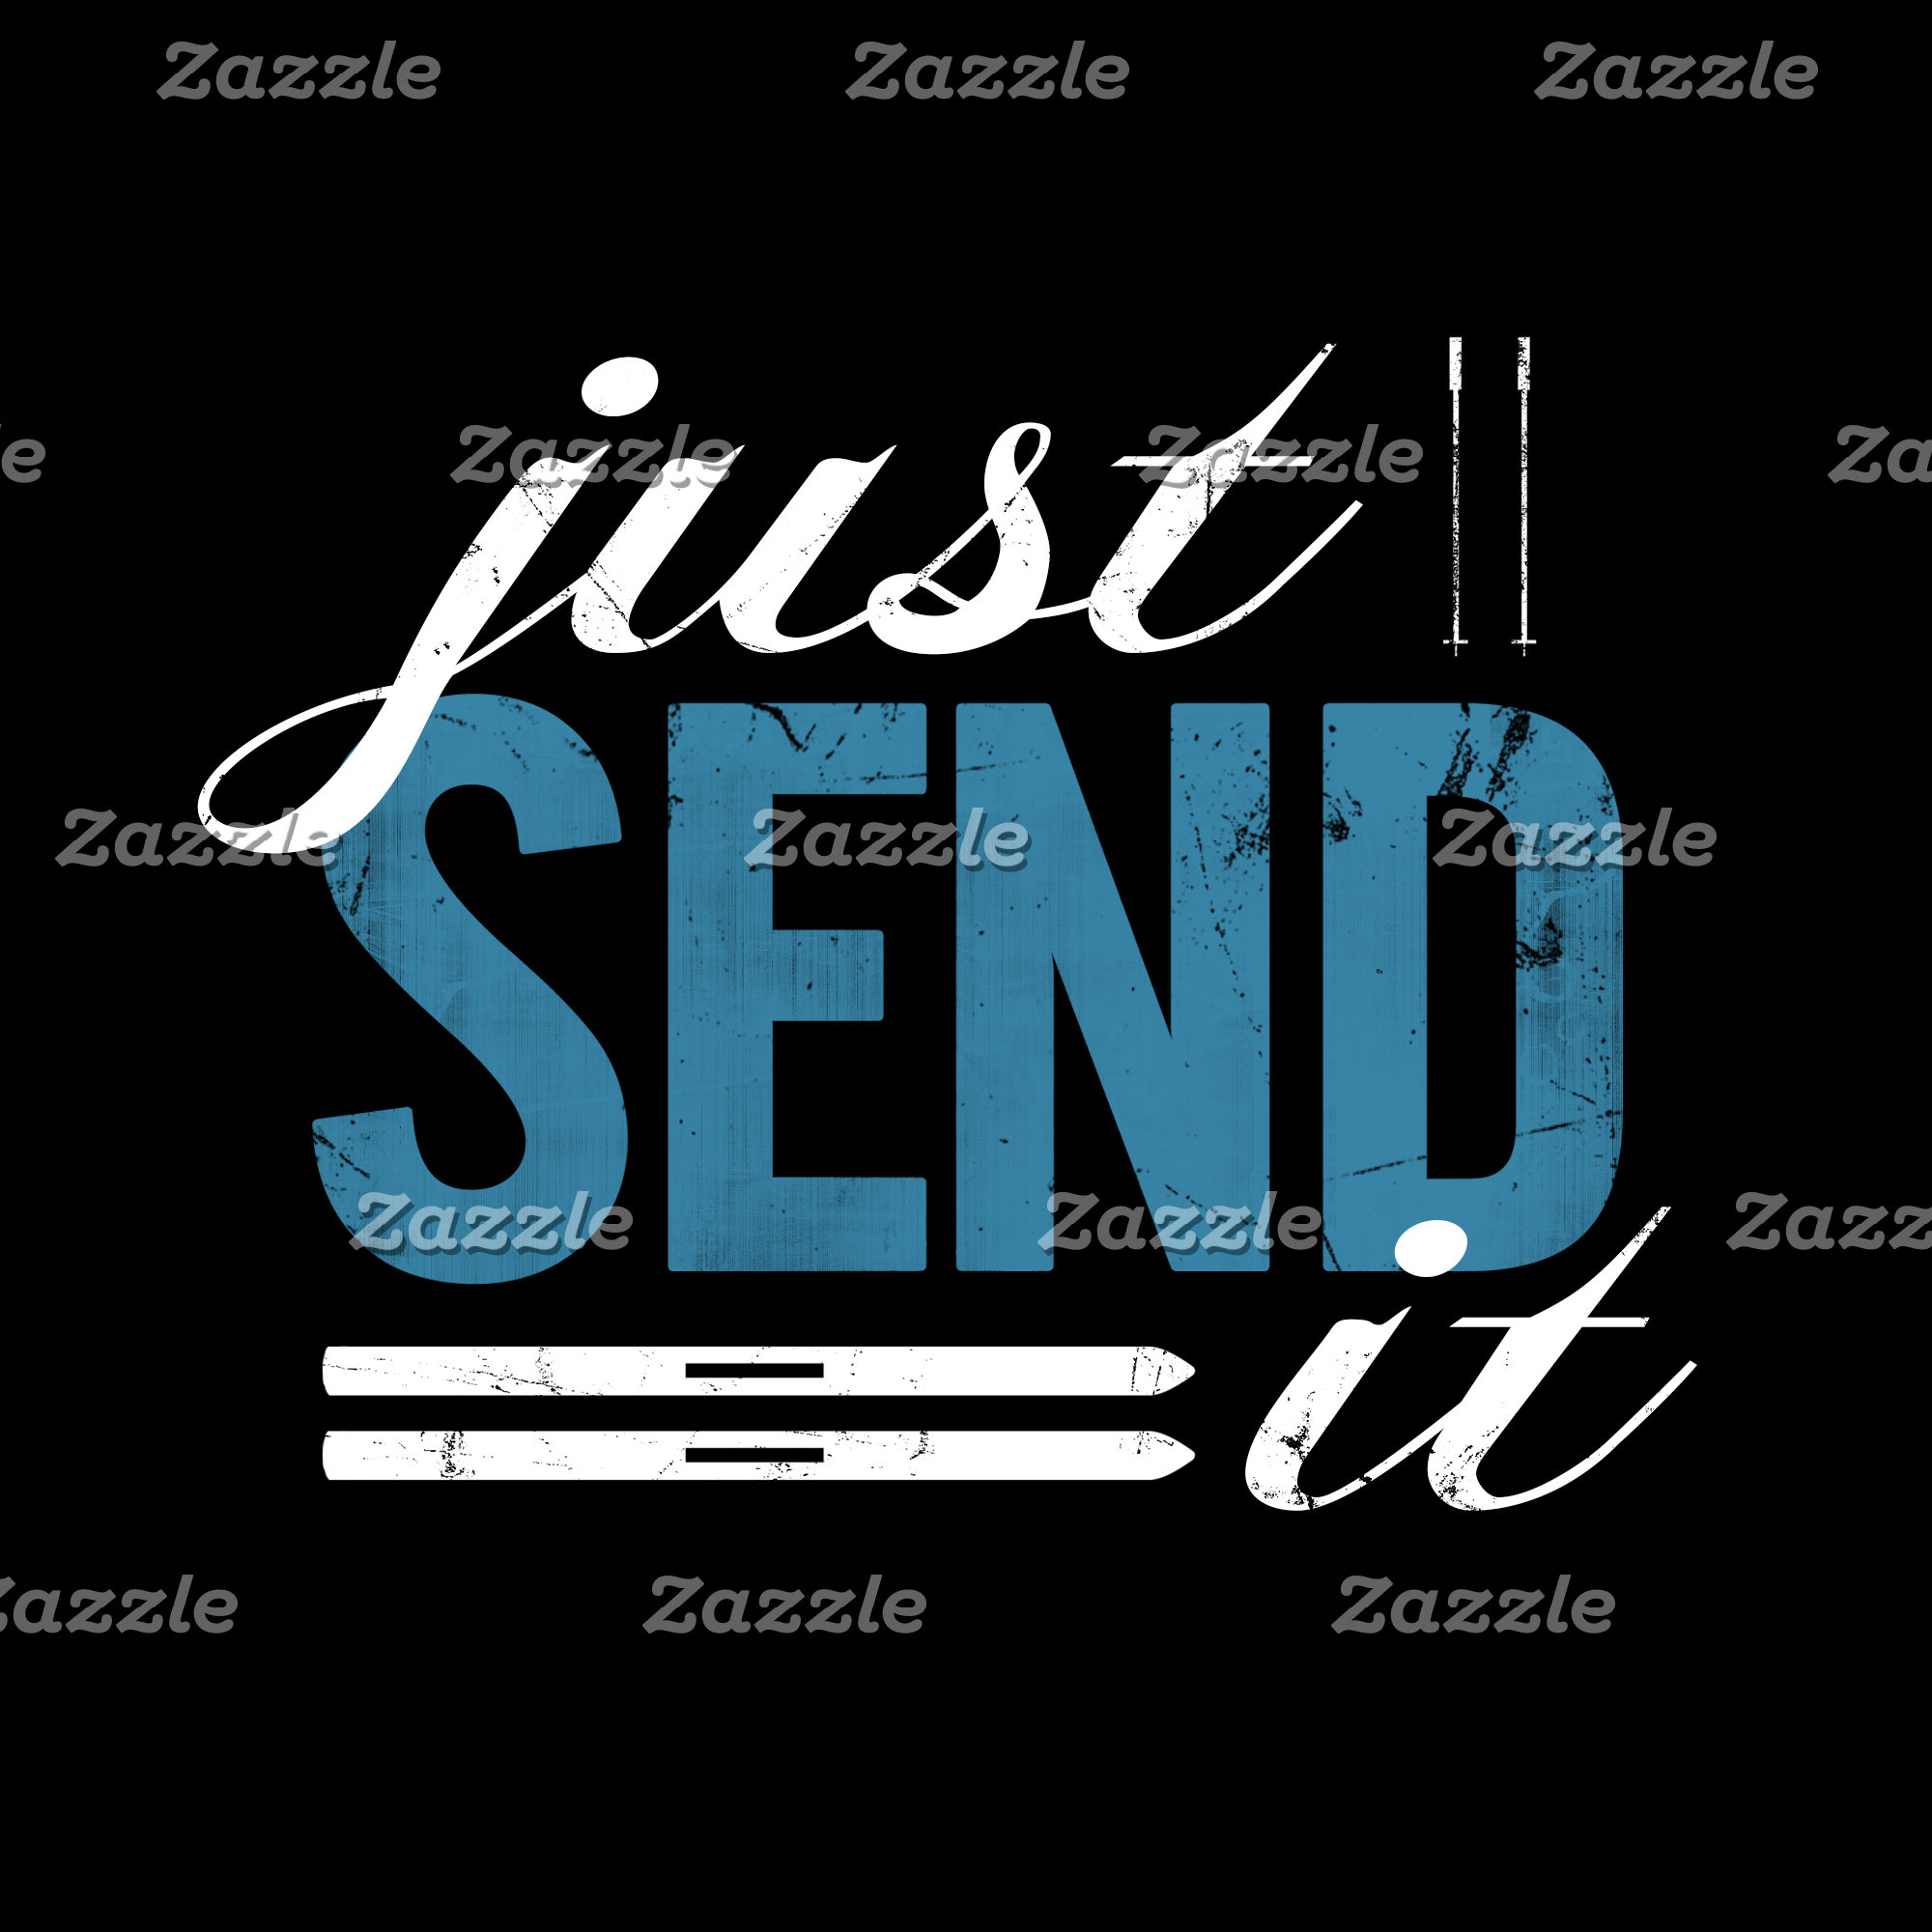 Just Send It